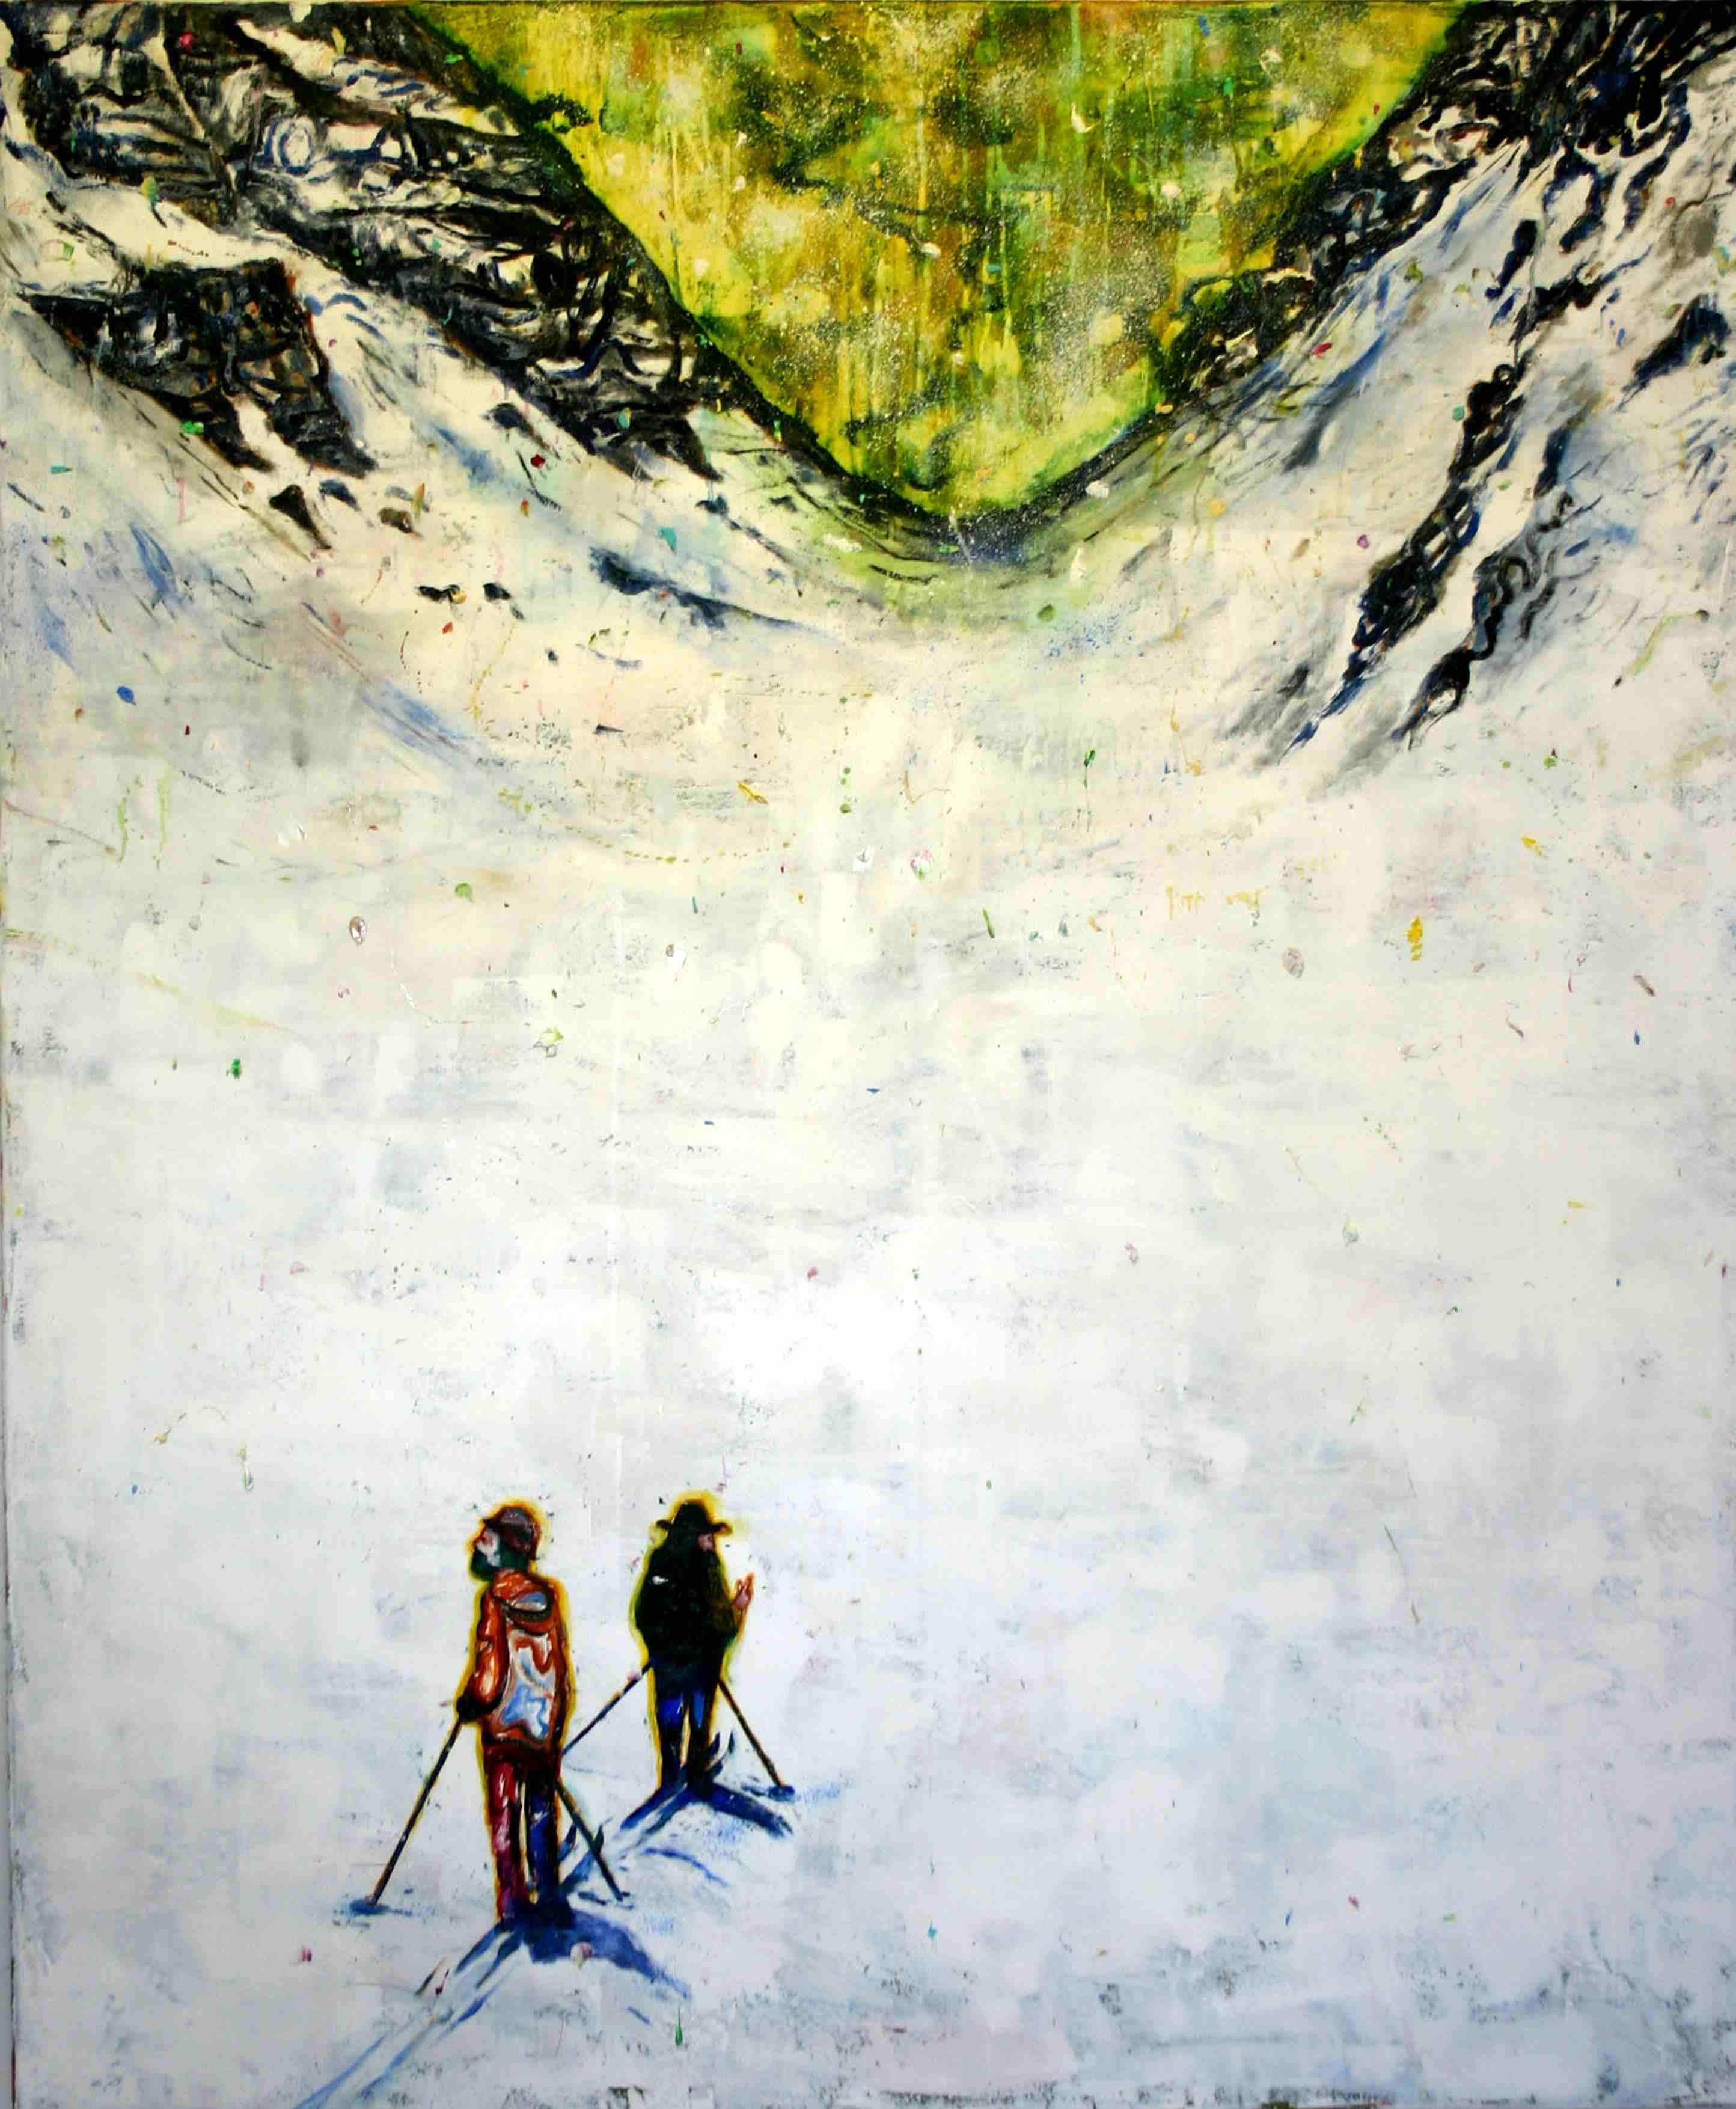 Olle Schmidt, Explorer 1, 2016, oil on canvas, 145 x 120 cm